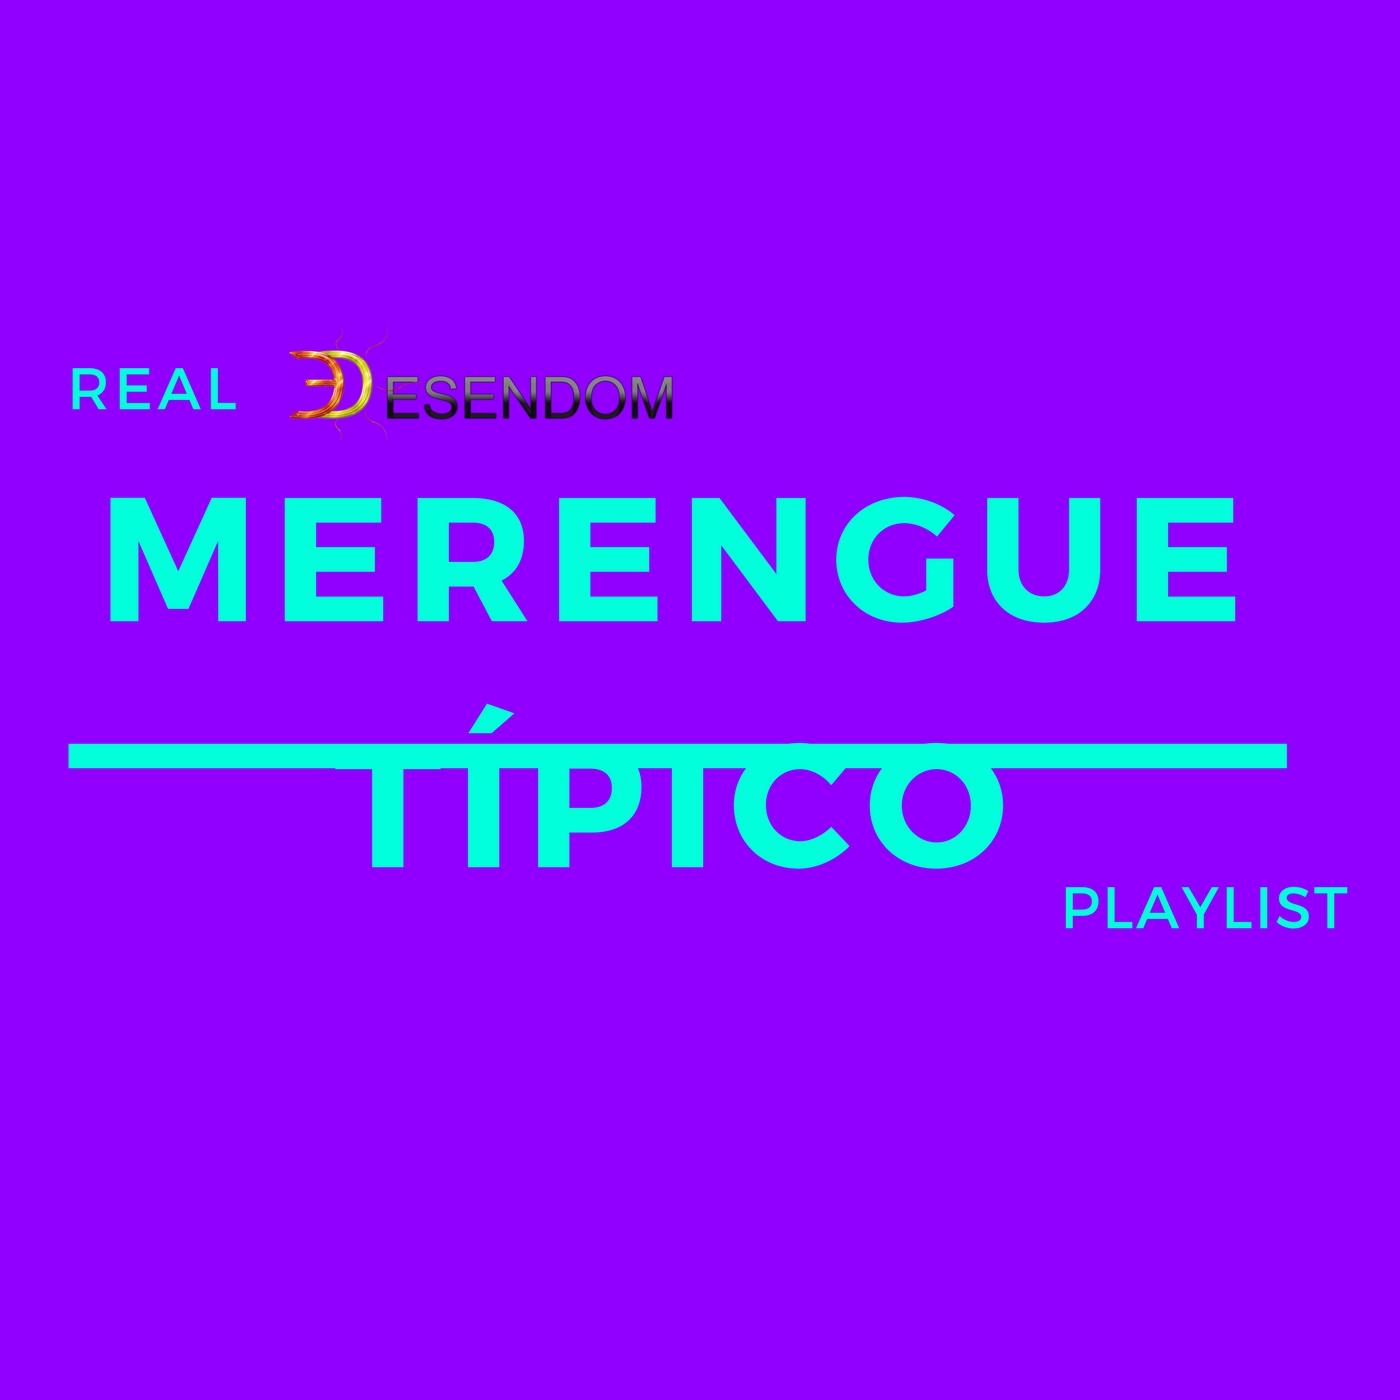 Real Tipico Playlistlogo.jpg